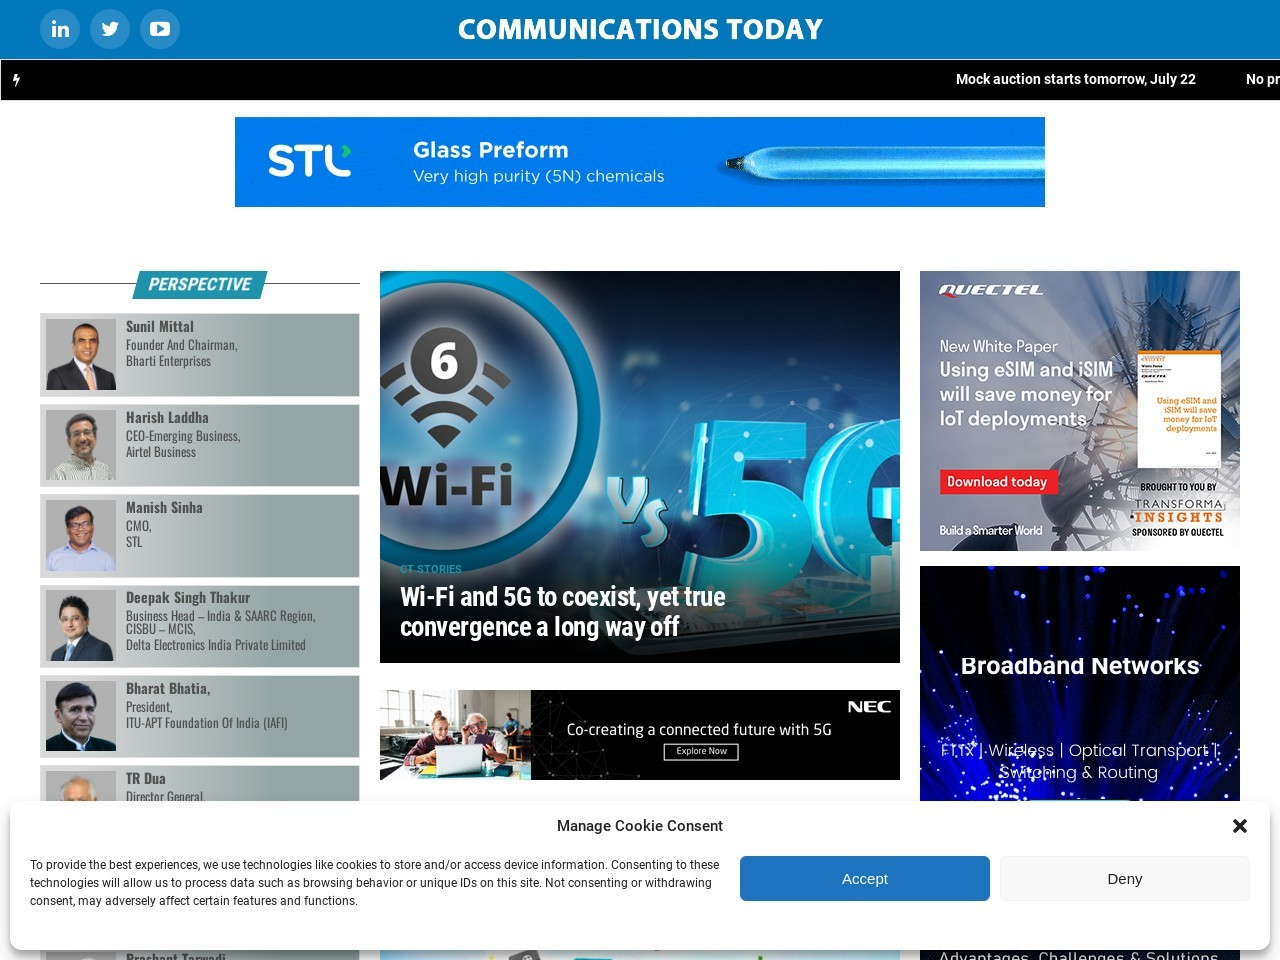 BSNL selects Novelsat for satellite broadband, backhaul services